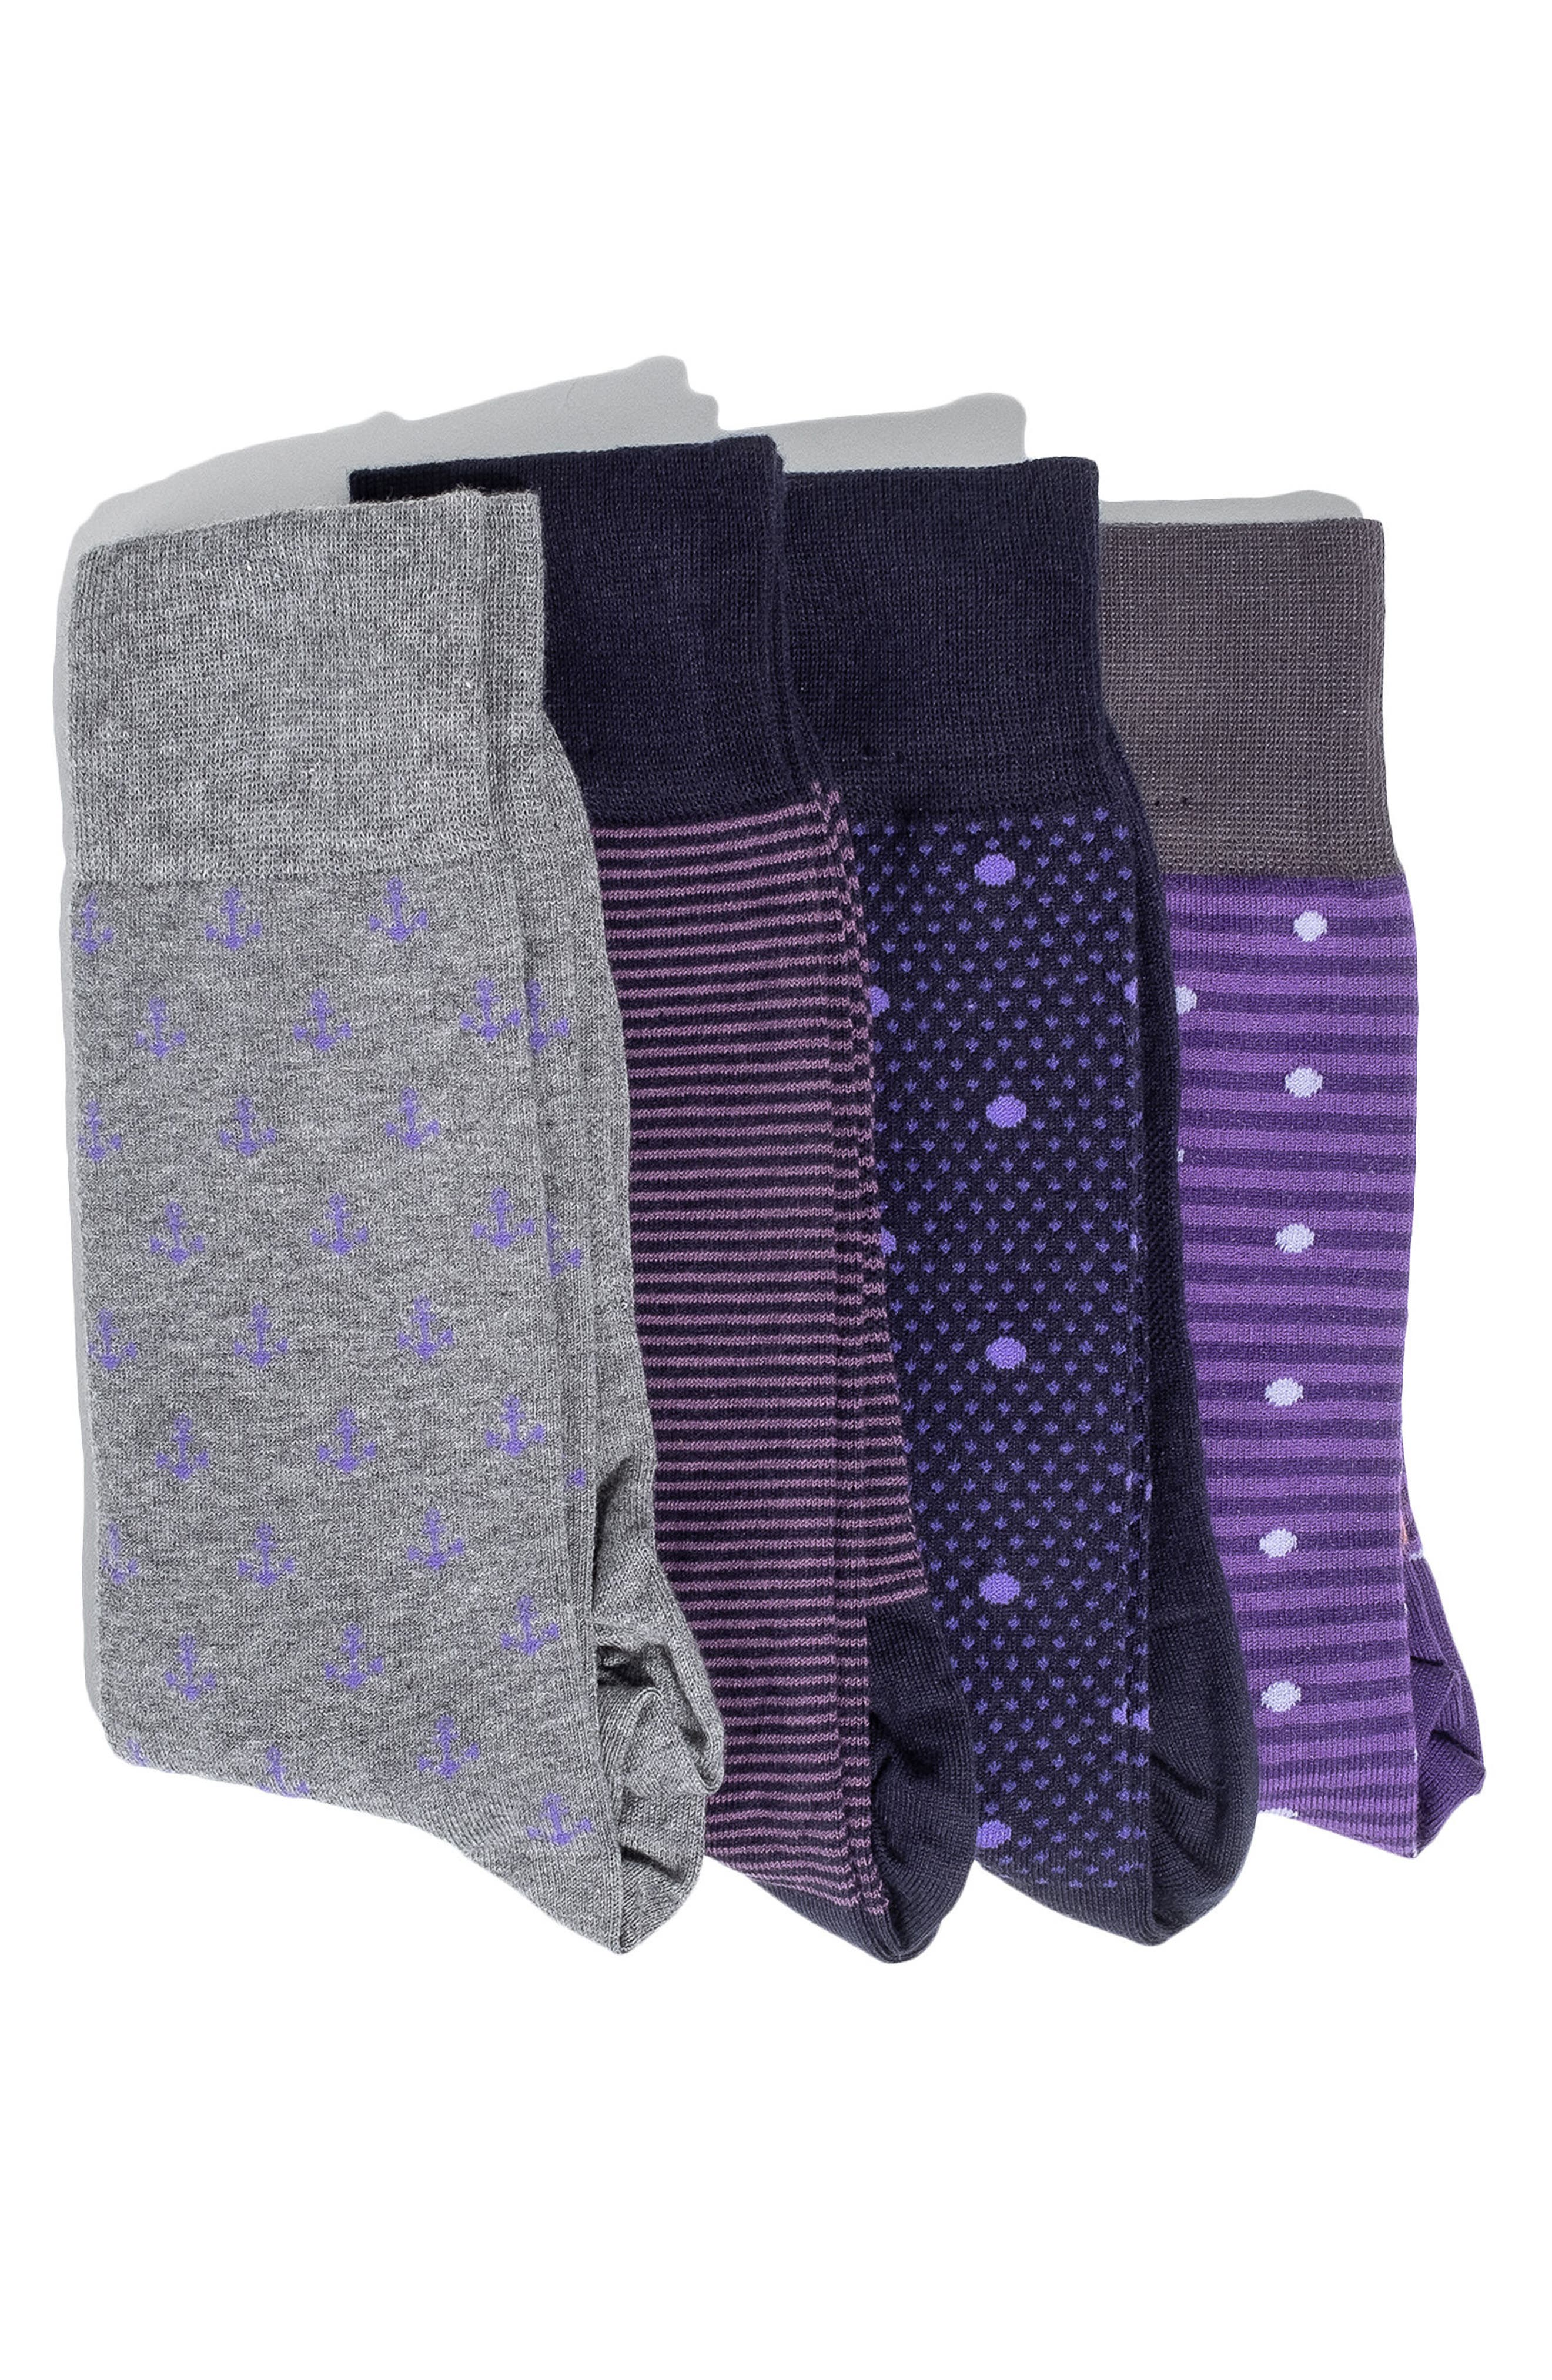 4-Pack Socks,                         Main,                         color, PURPLE